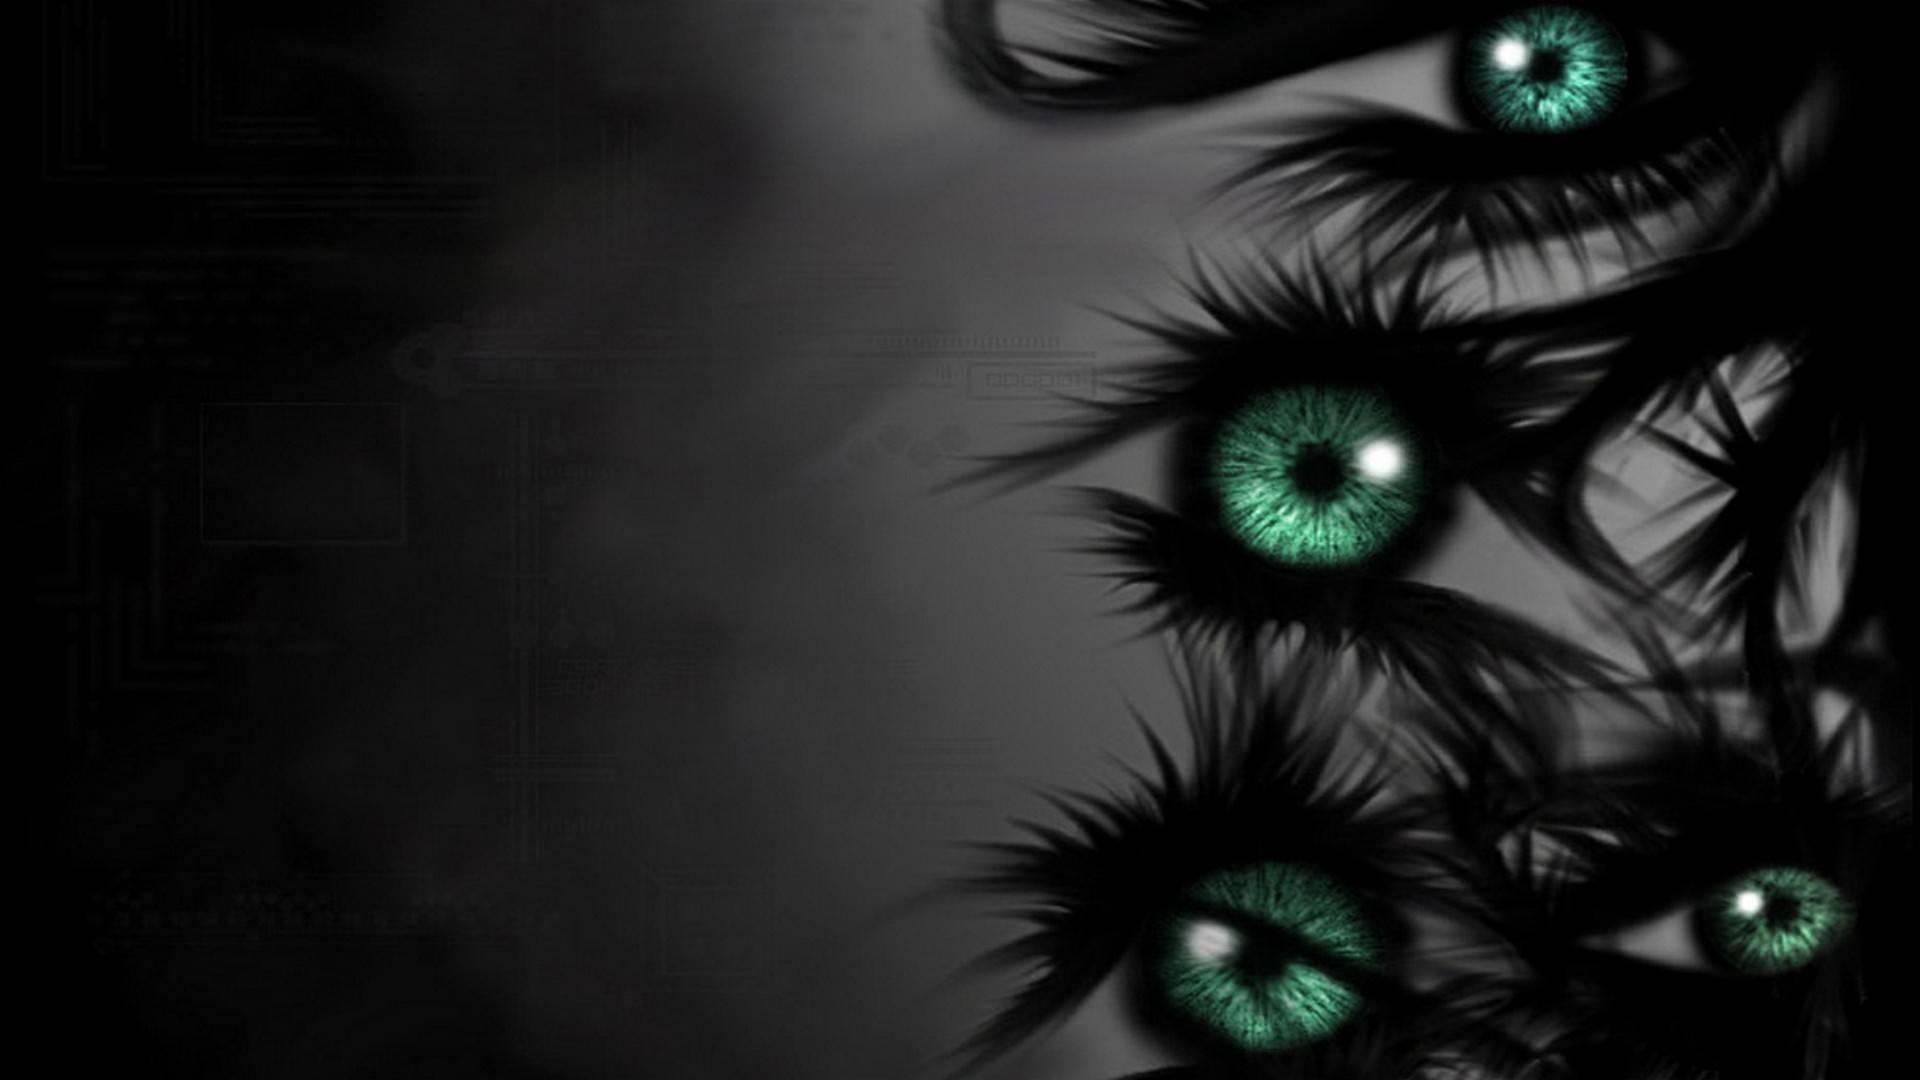 Eyes Dark 19201080 Wallpaper 1714306 1920x1080